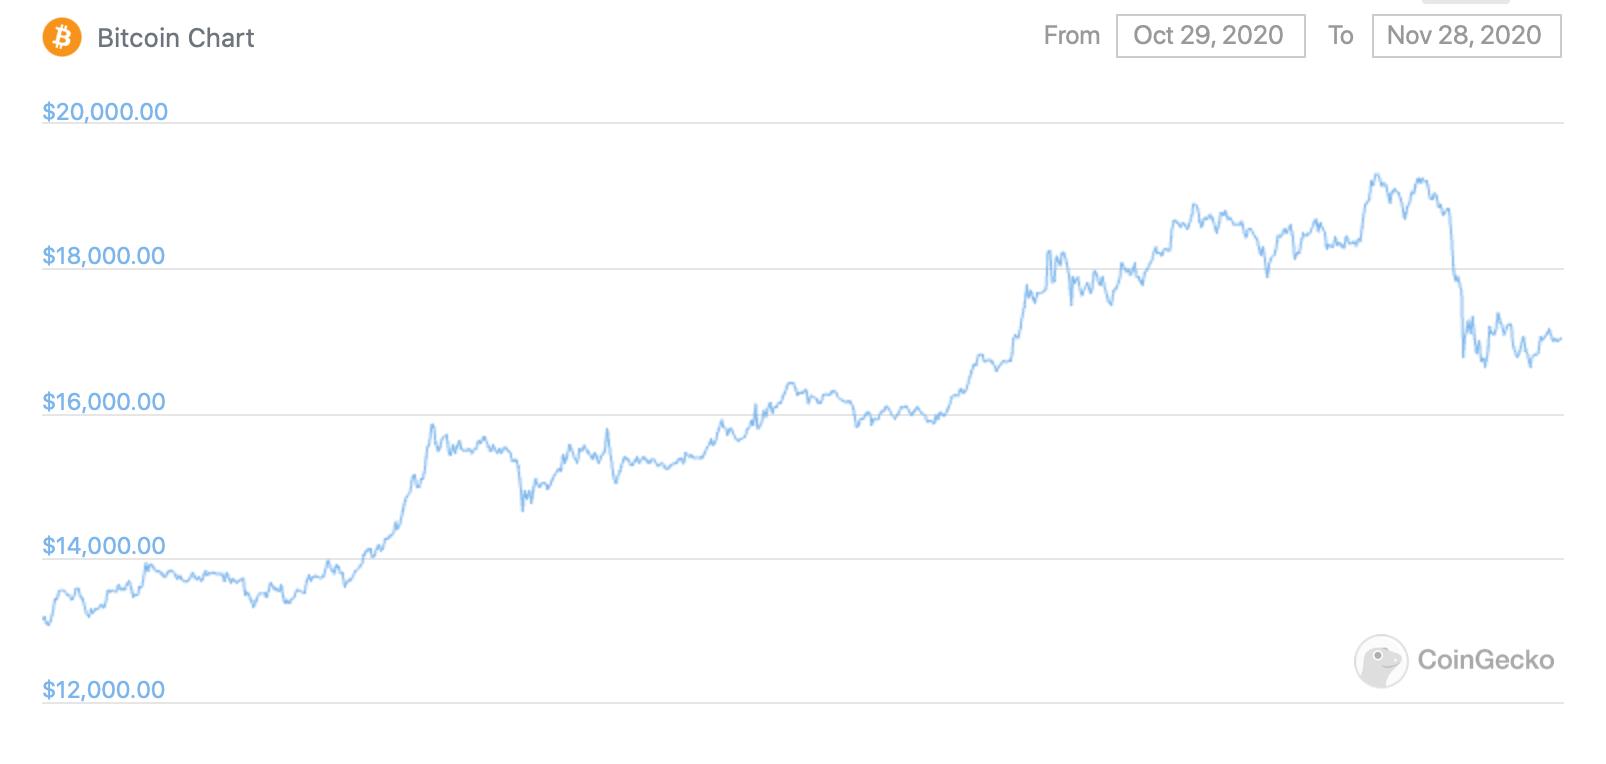 График курса Биткоина месяц